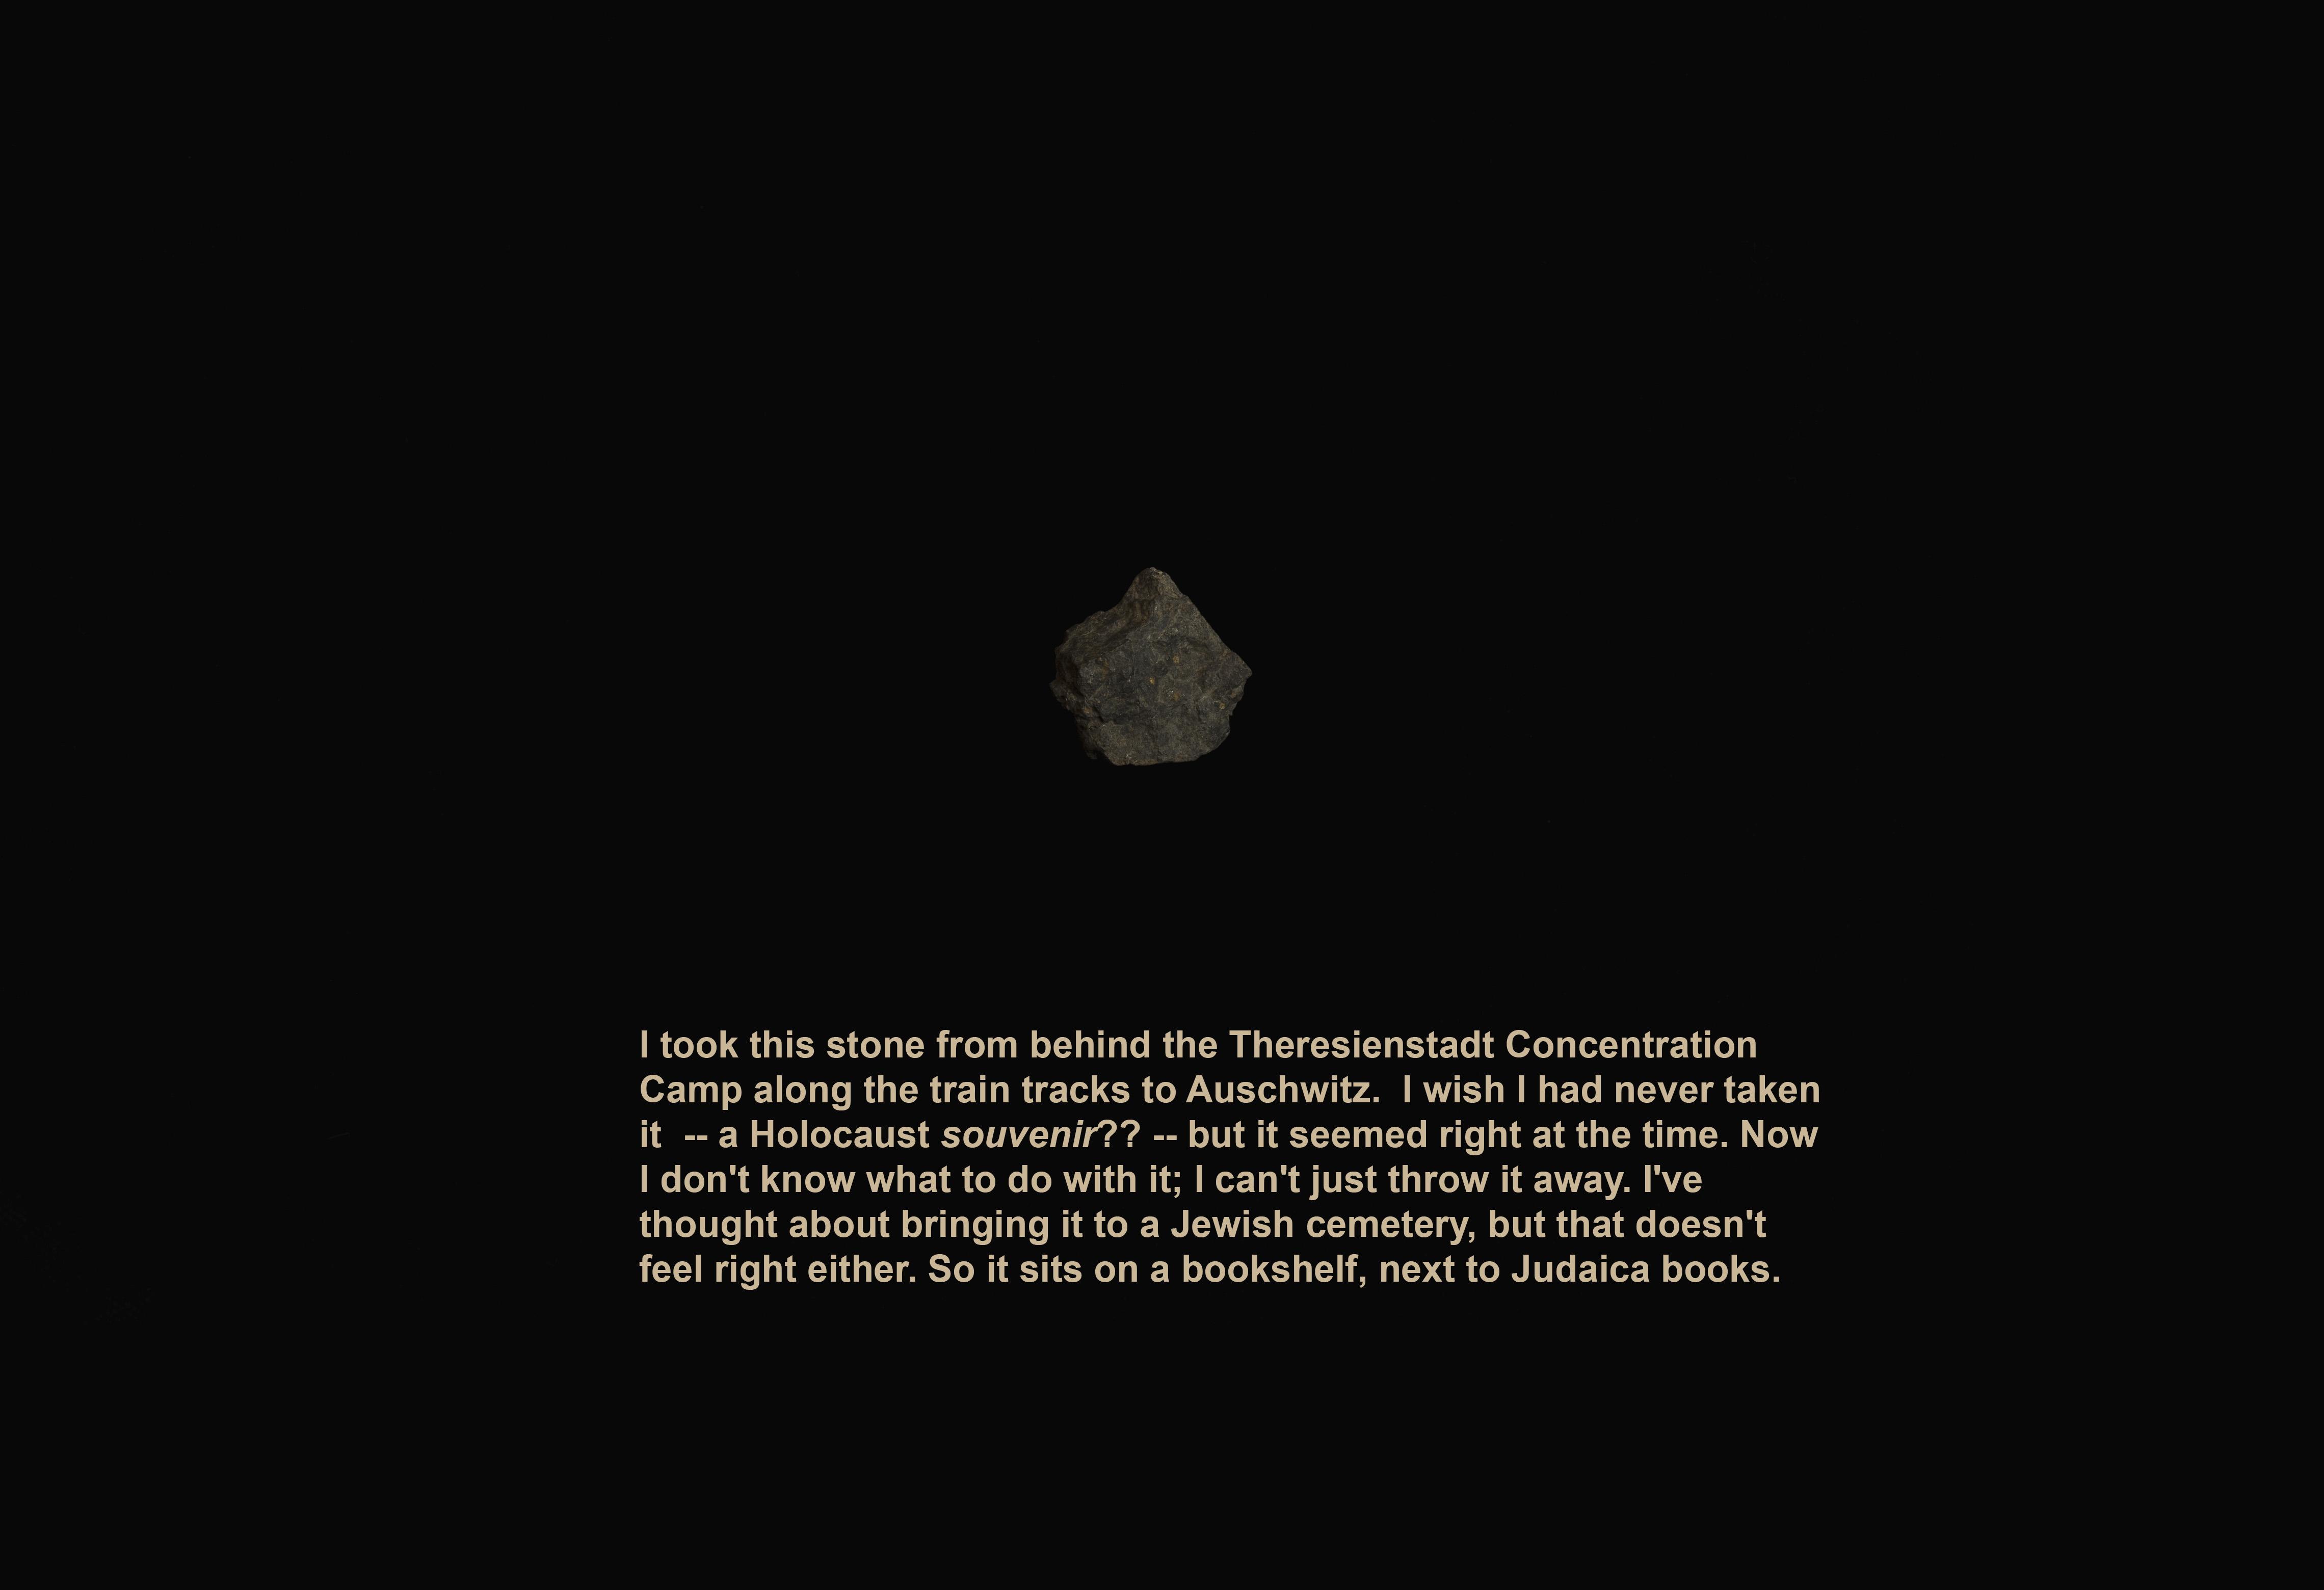 41_Holocaust stone_9300_final_PG